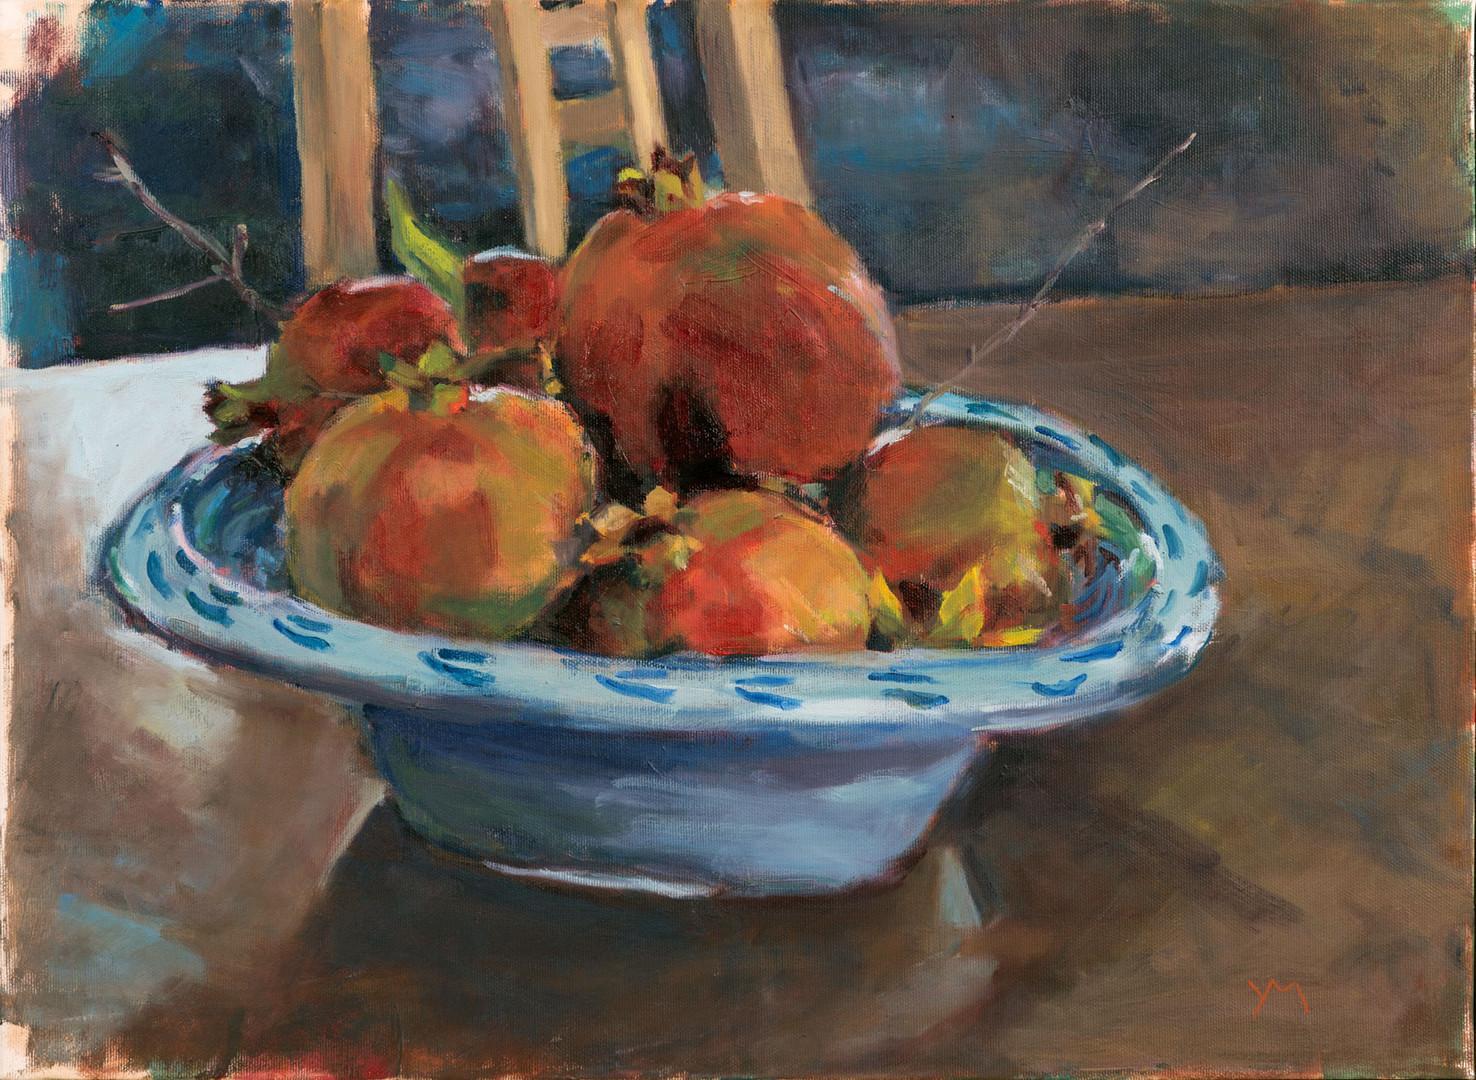 Pomegranates in a Spanish bowl